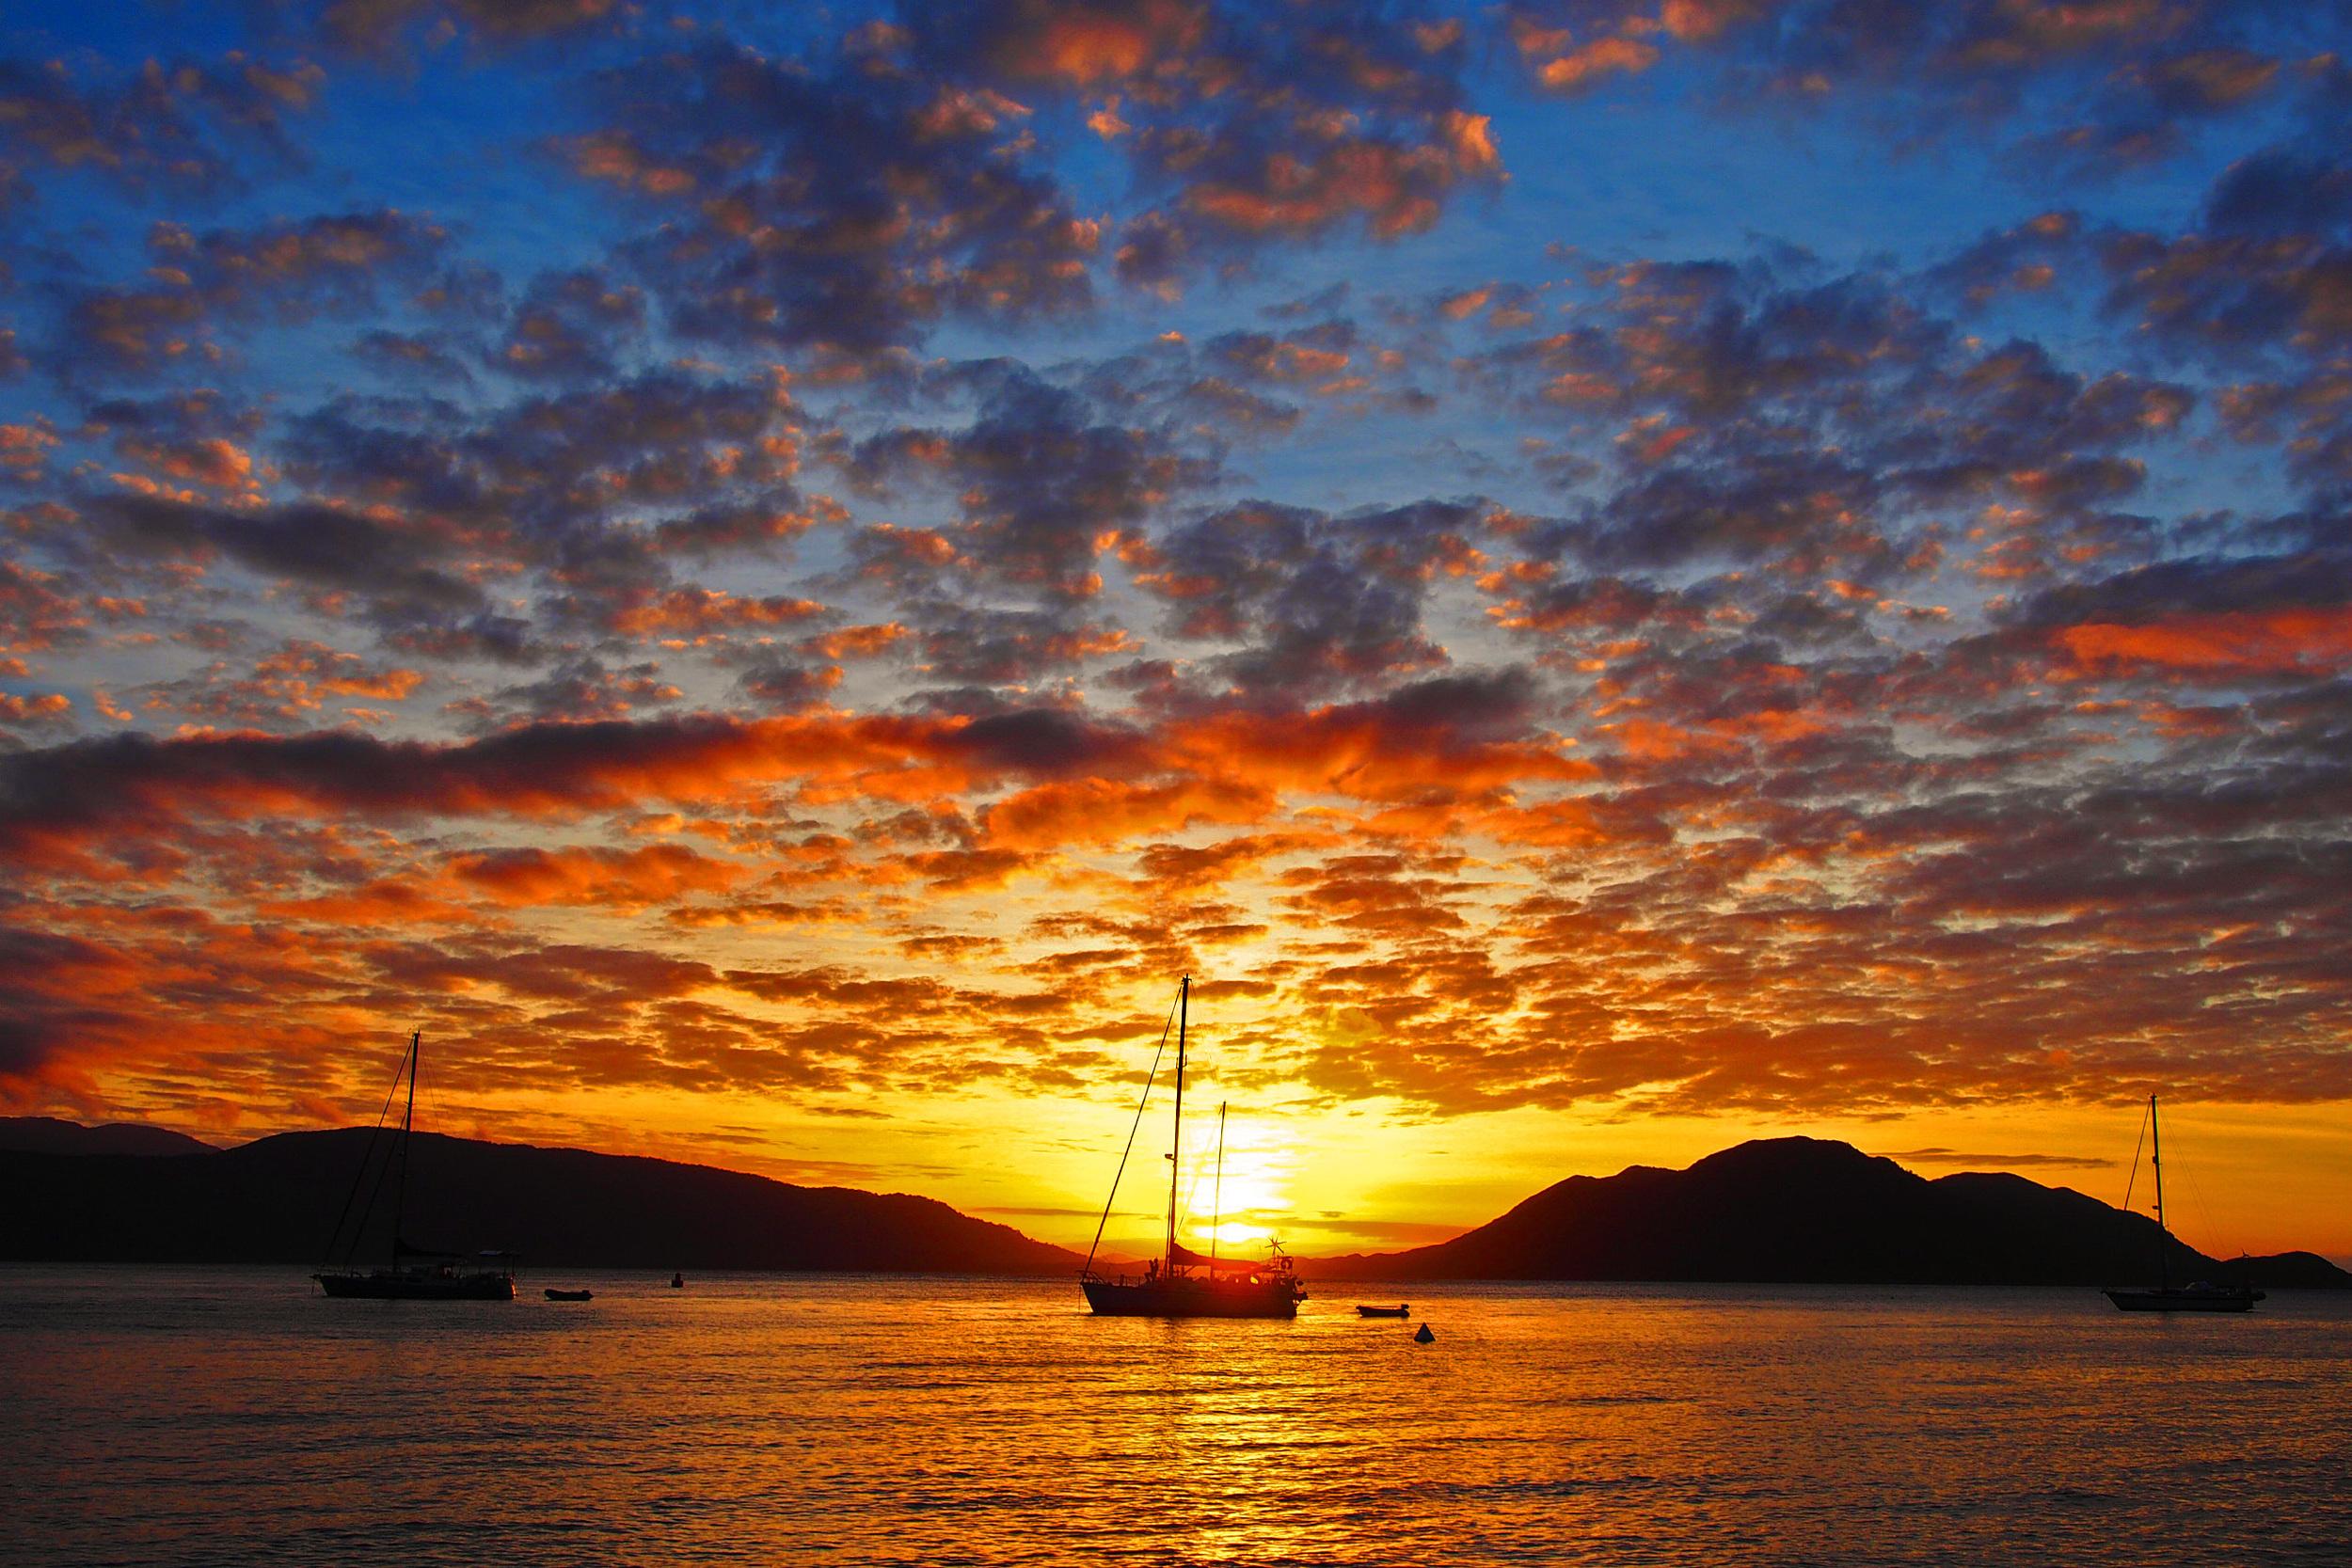 fitzroy-island-resort-great-barrier-reef-australia-hotel-accommodation (6).jpg